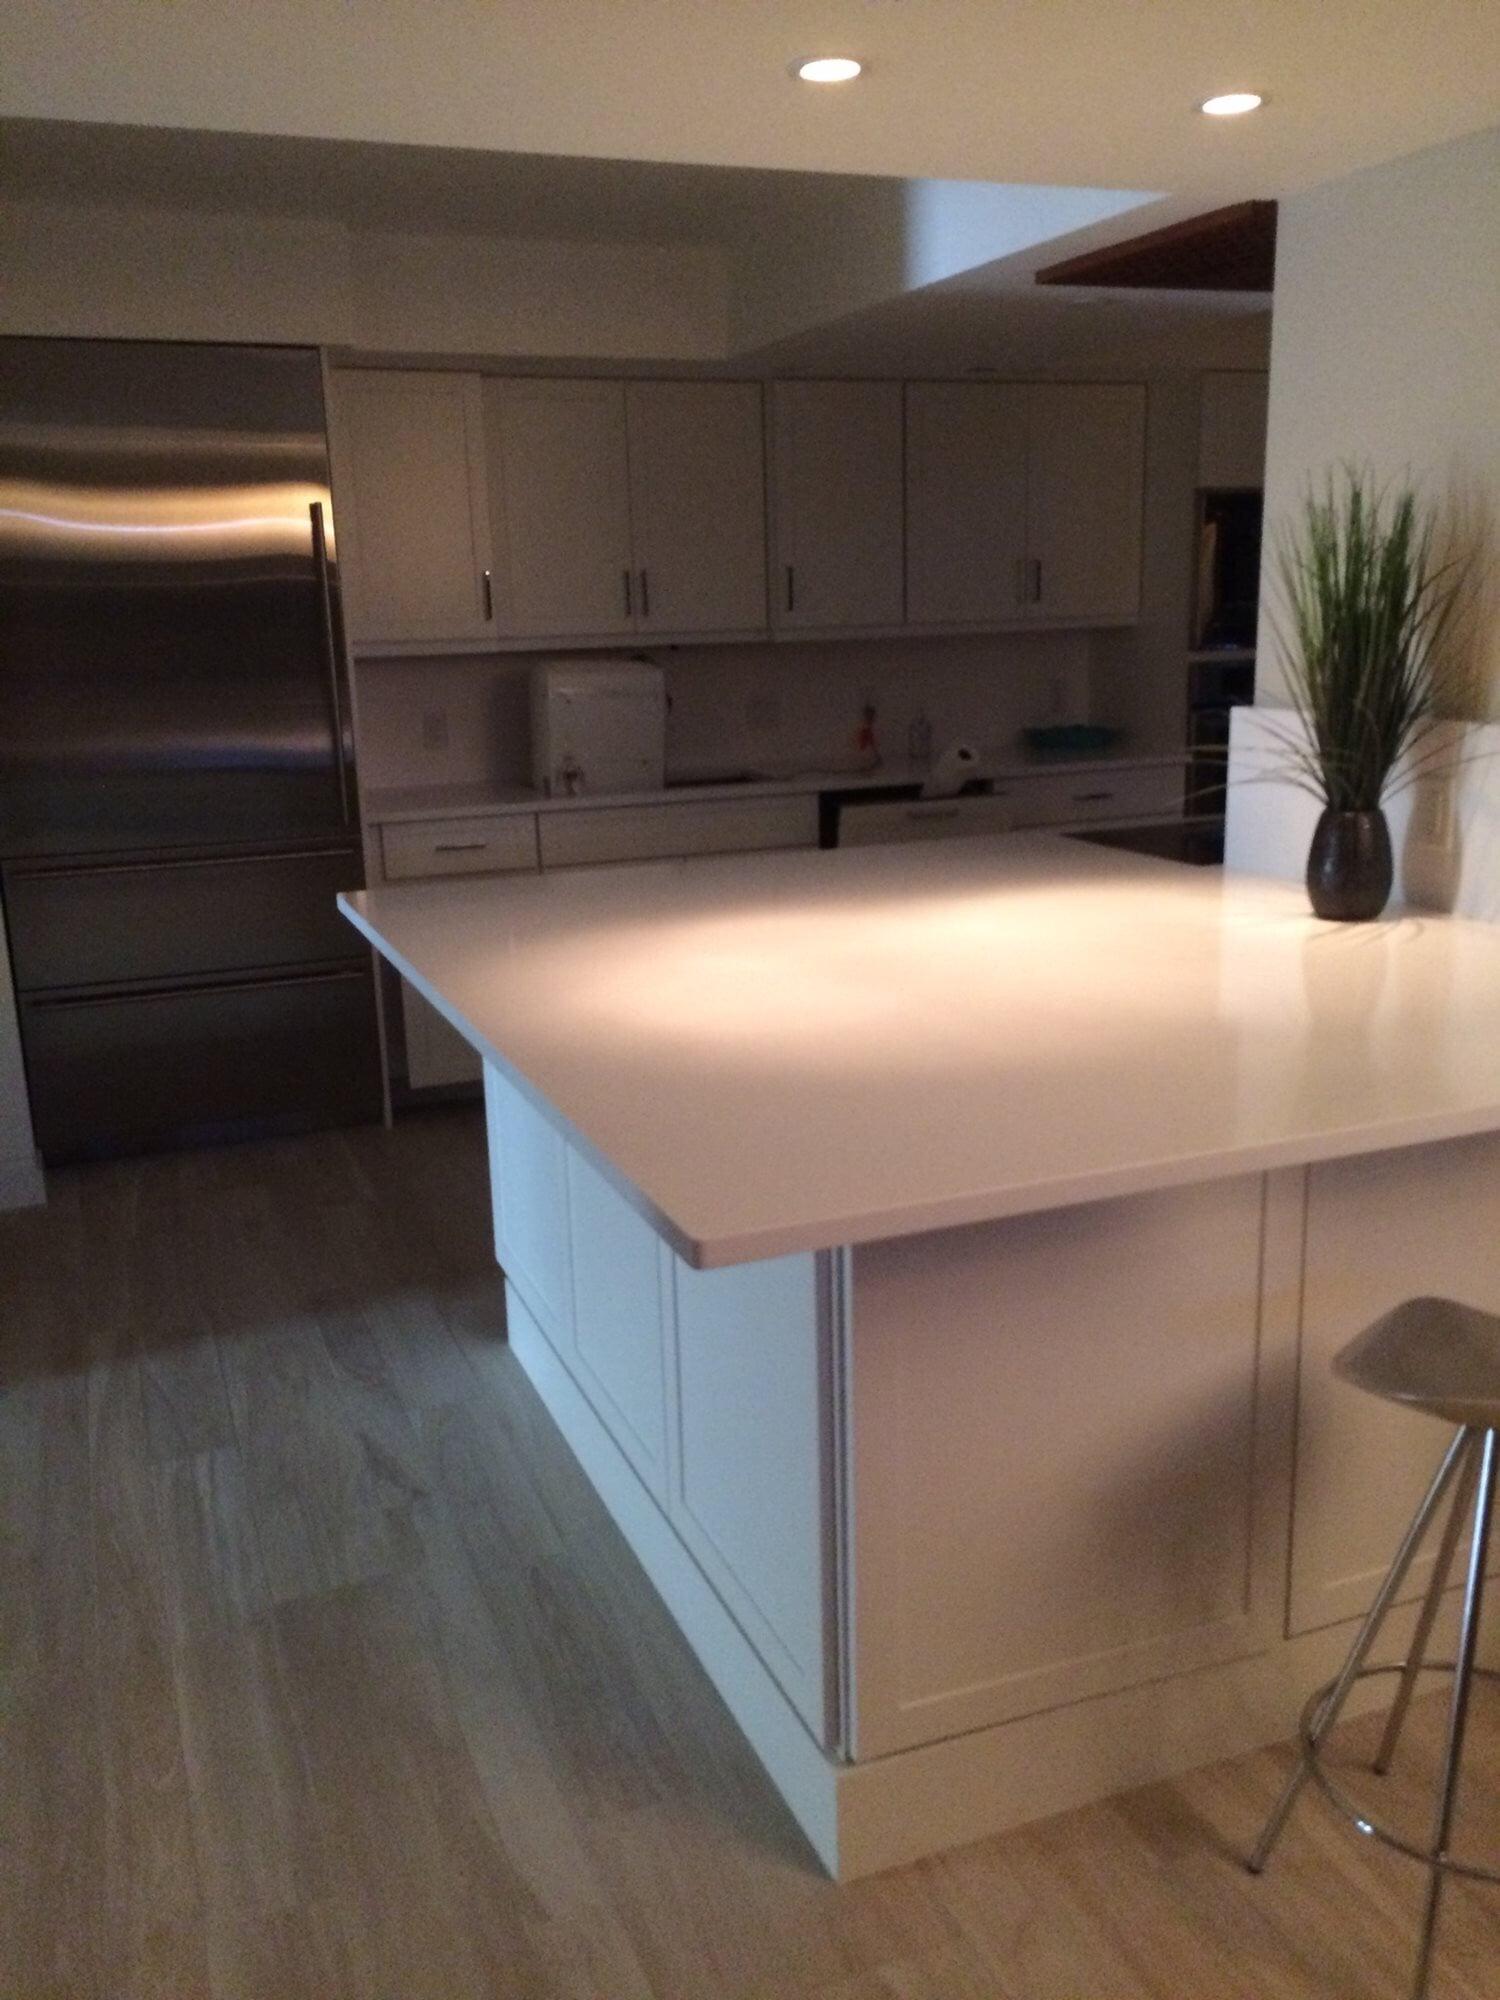 Clean kitchen design in Jupiter, FL from Floors For You Kitchen & Bath